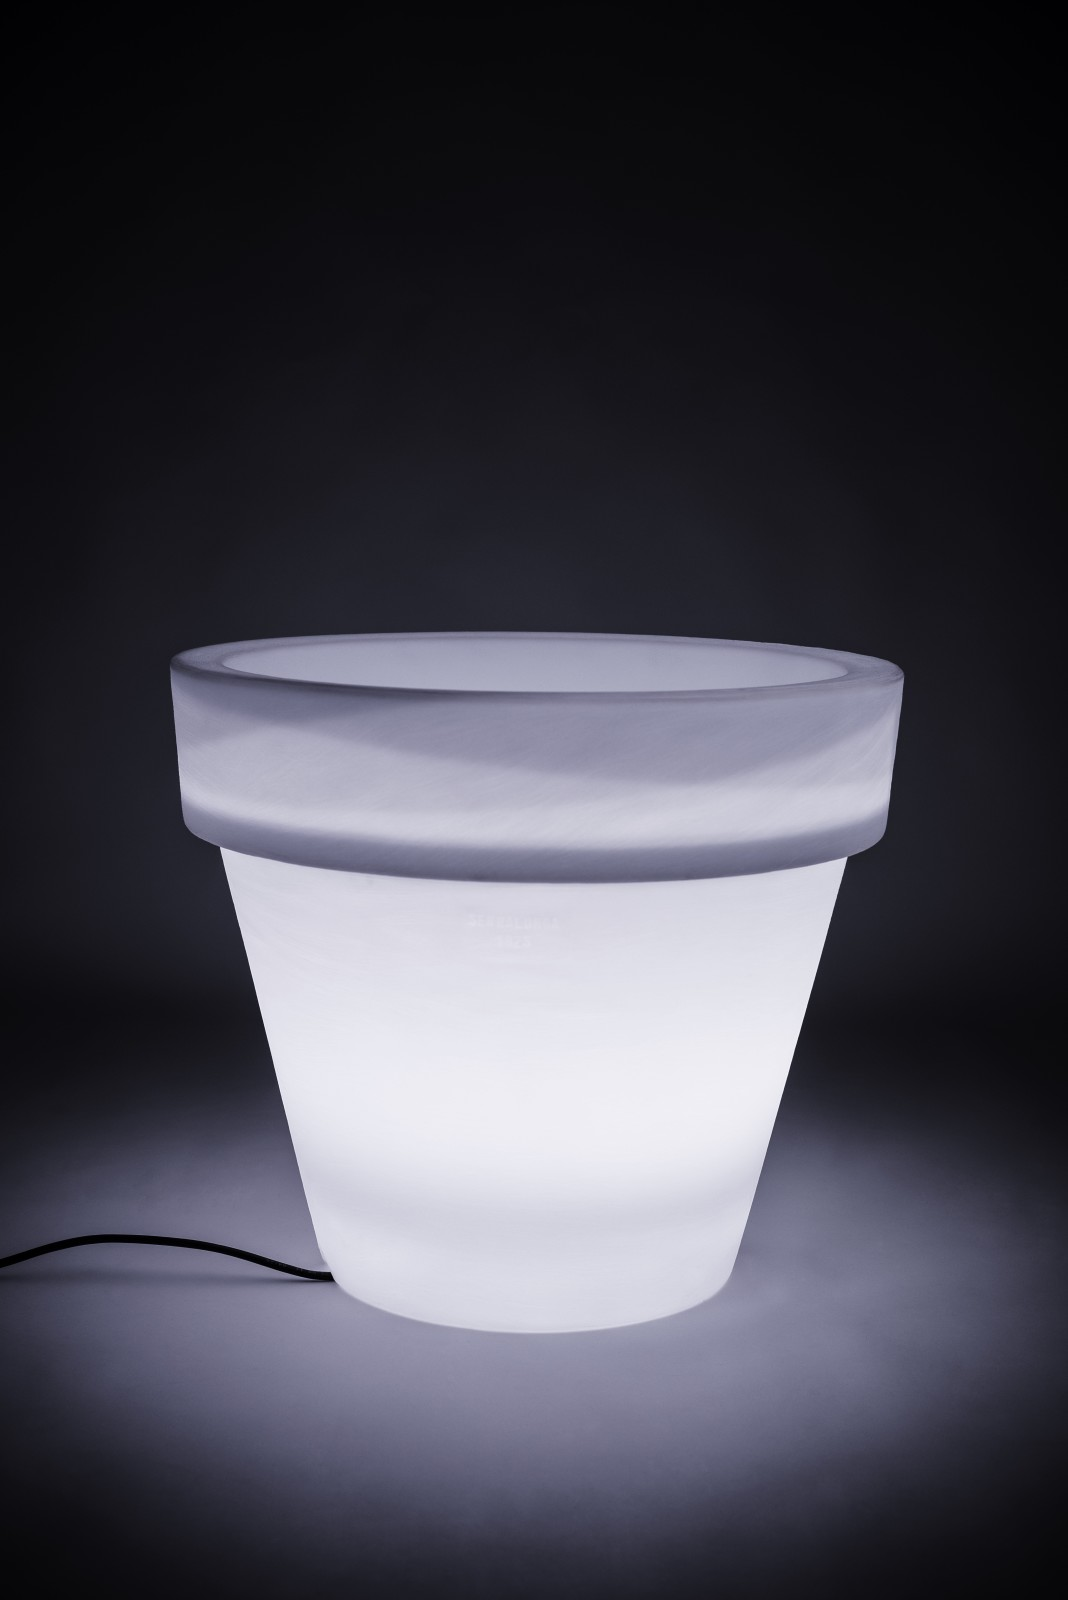 Bordato Liscio Outdoor Light Extra Large, LED RGB